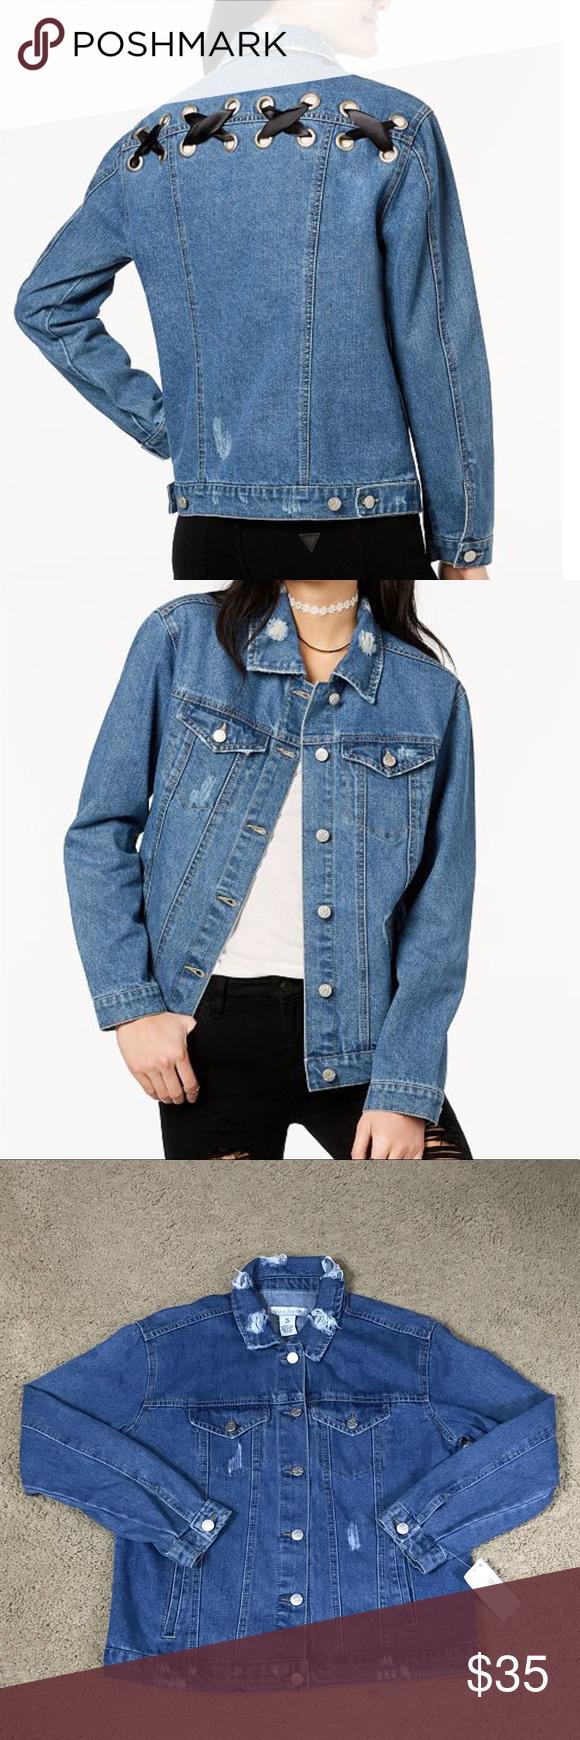 Lace Up Denim Jacket Denim Jacket Jackets Jacket Brands